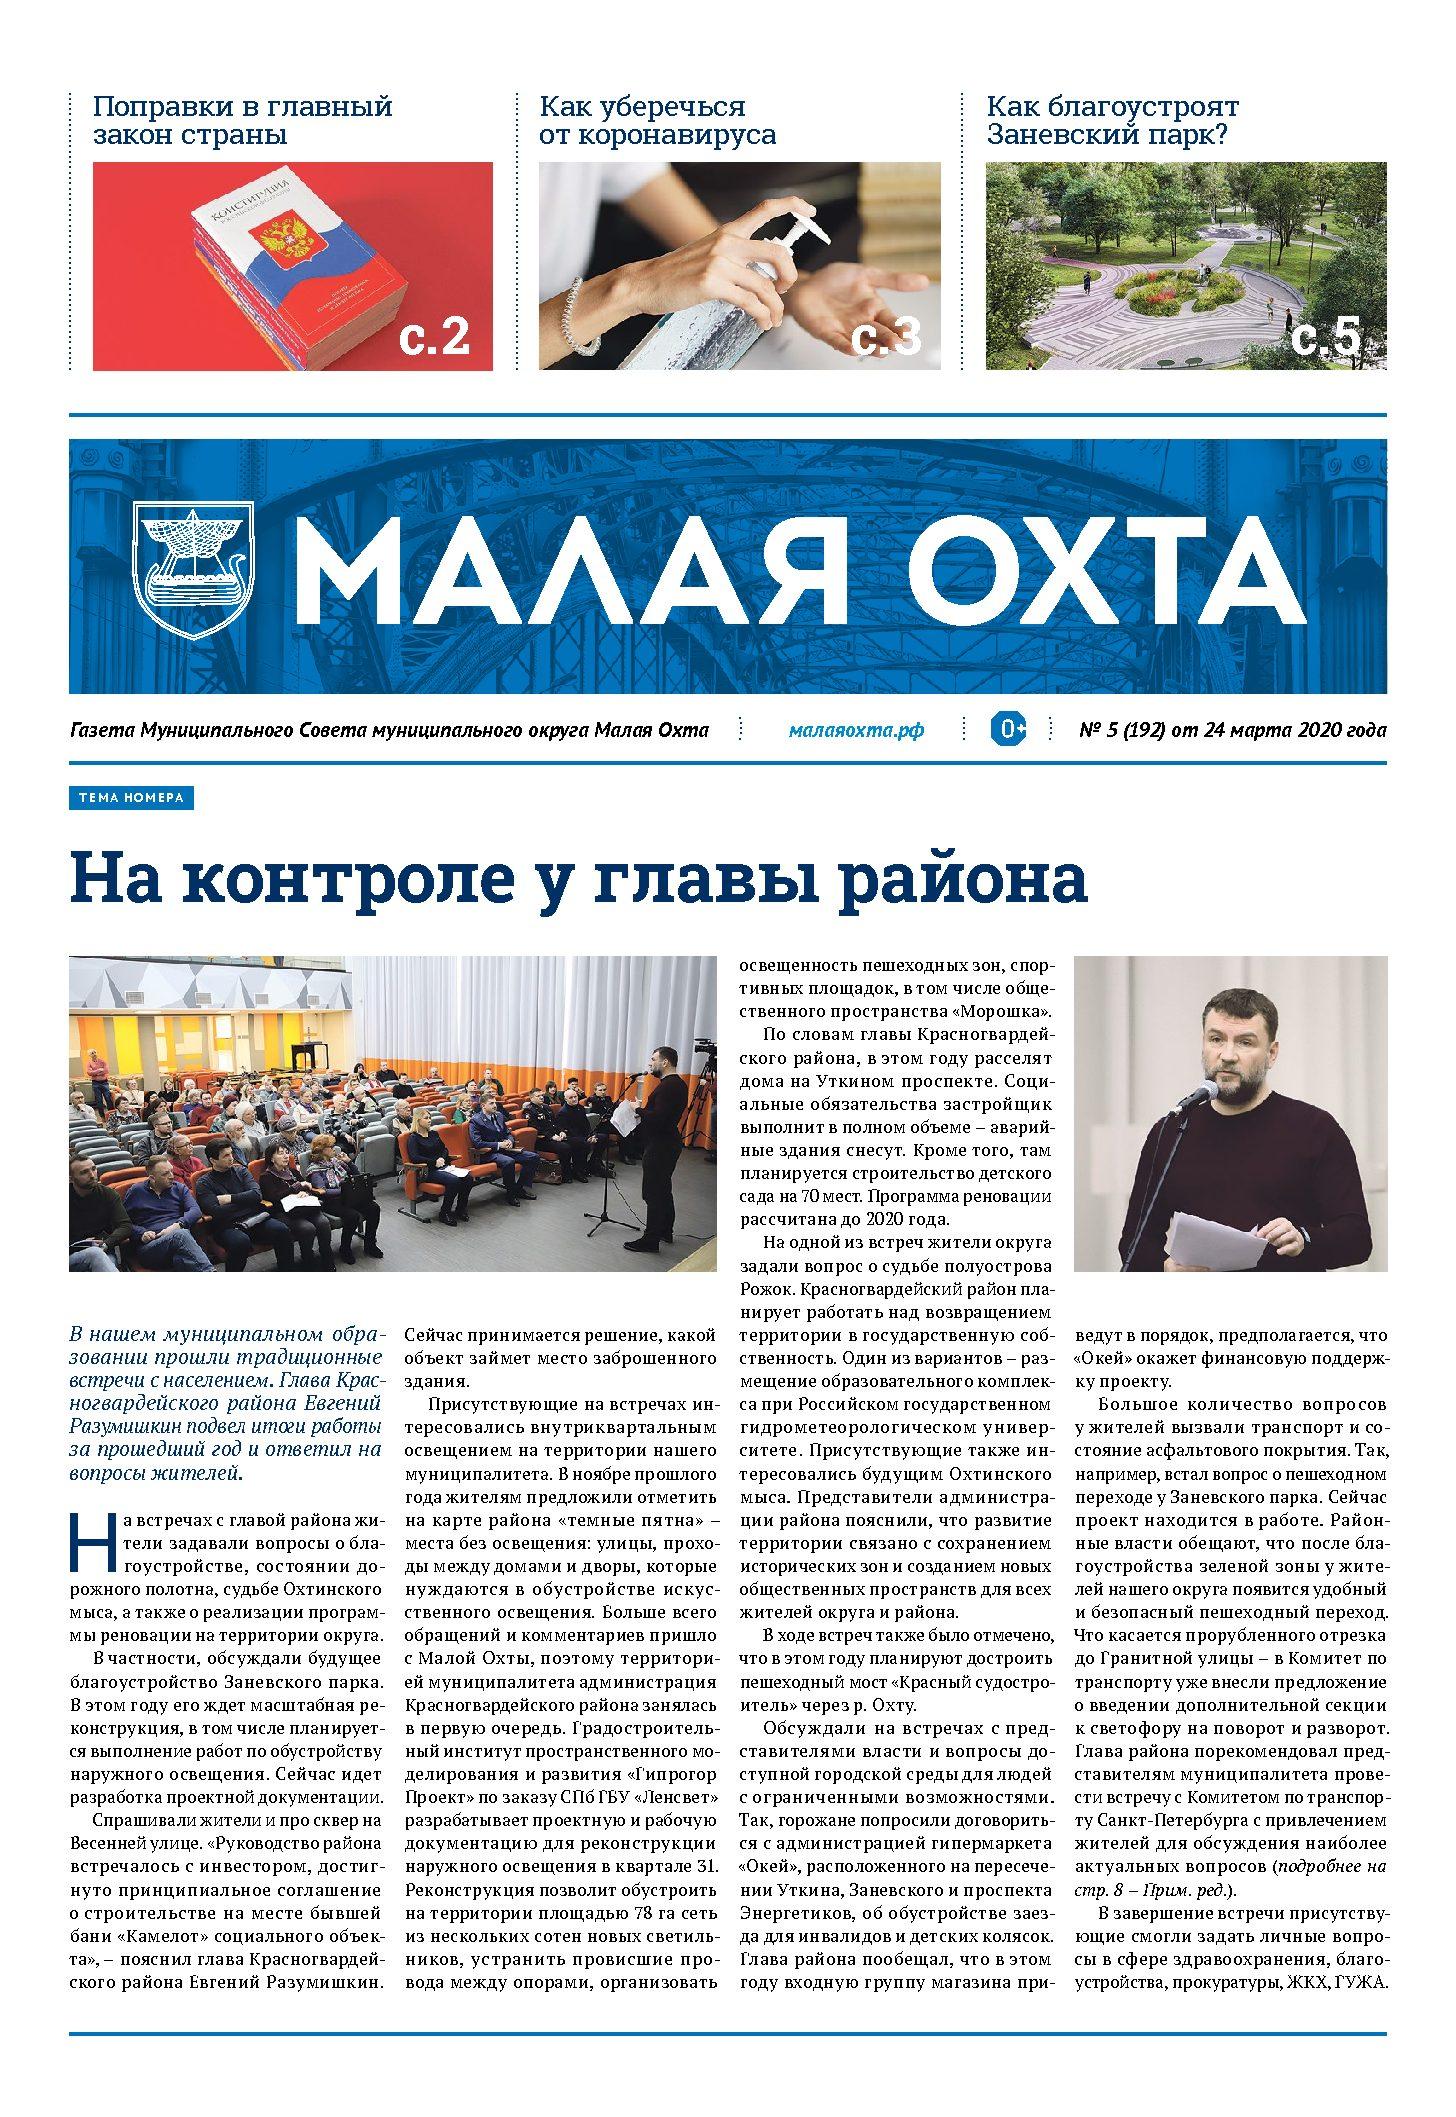 Газета №5 2020